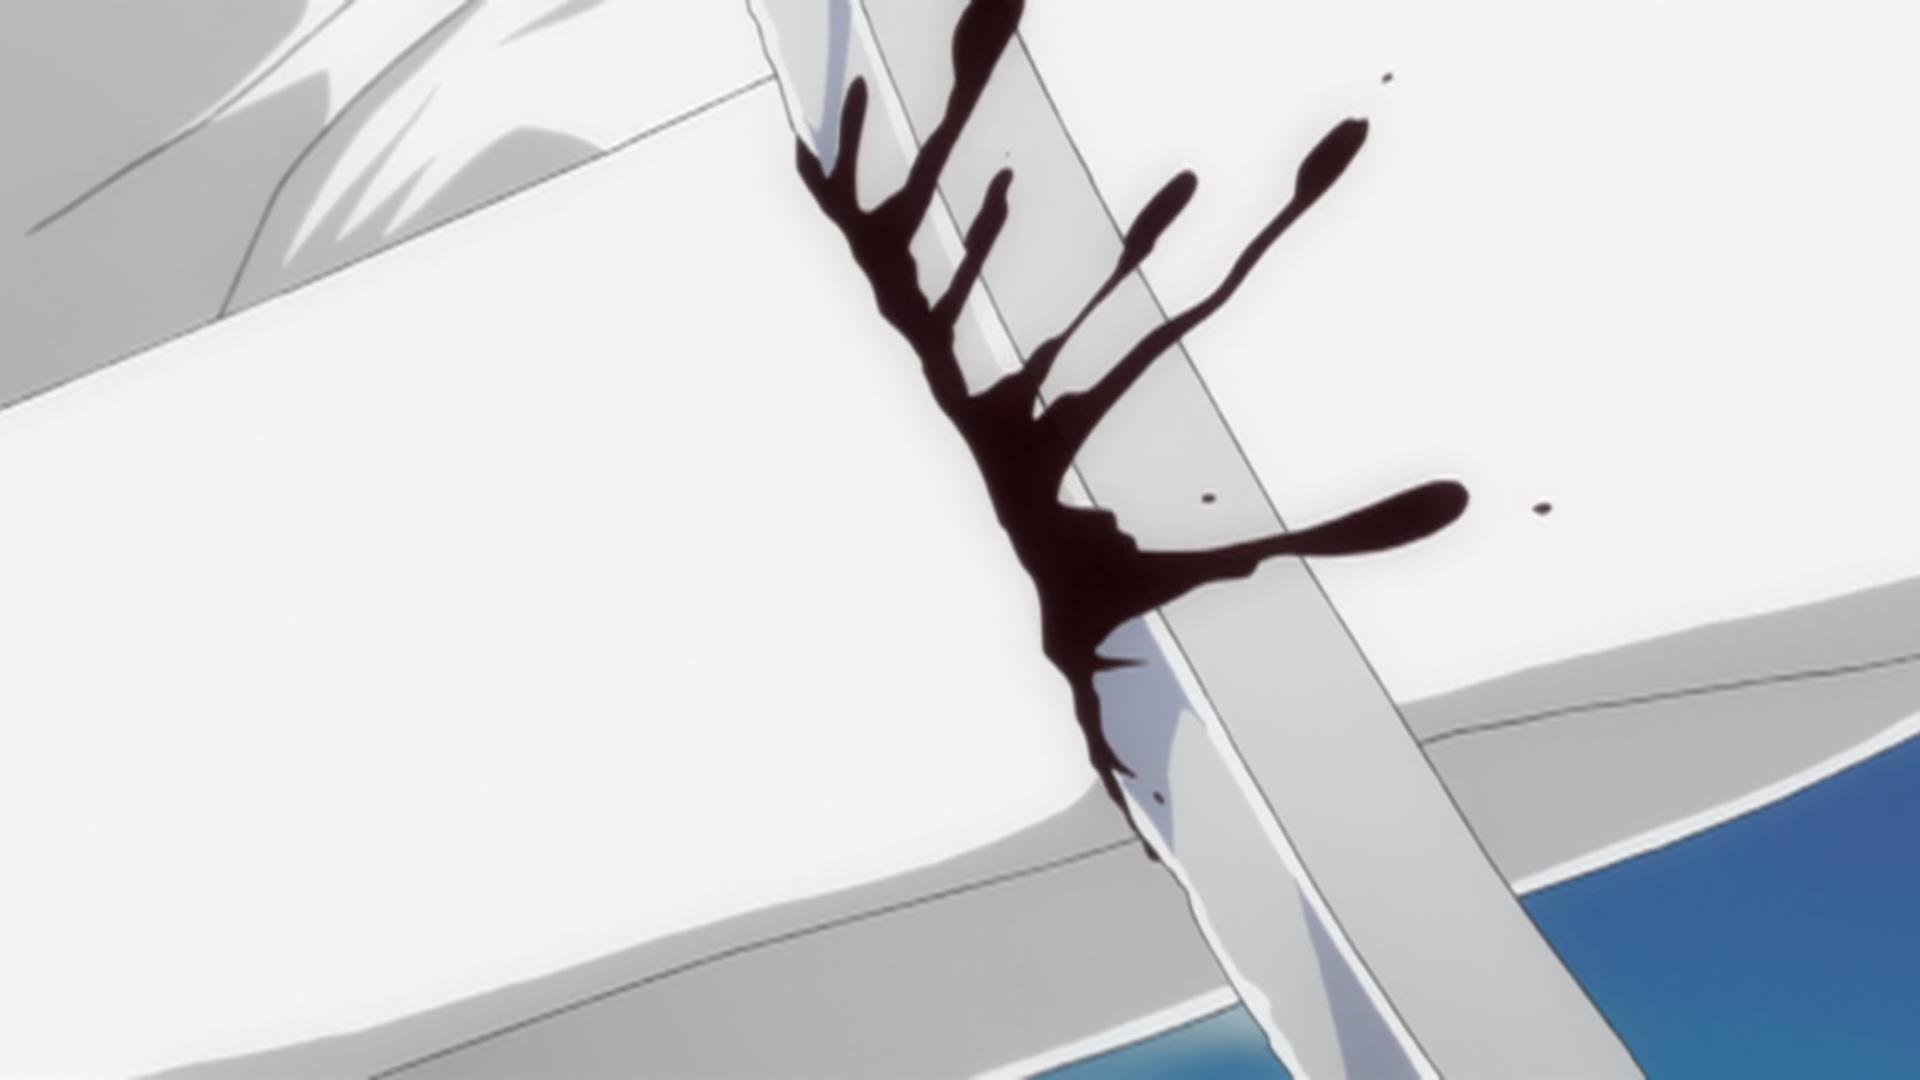 Anime Girl Cutting Herself Zy's Blog: Nnoitra Gil...